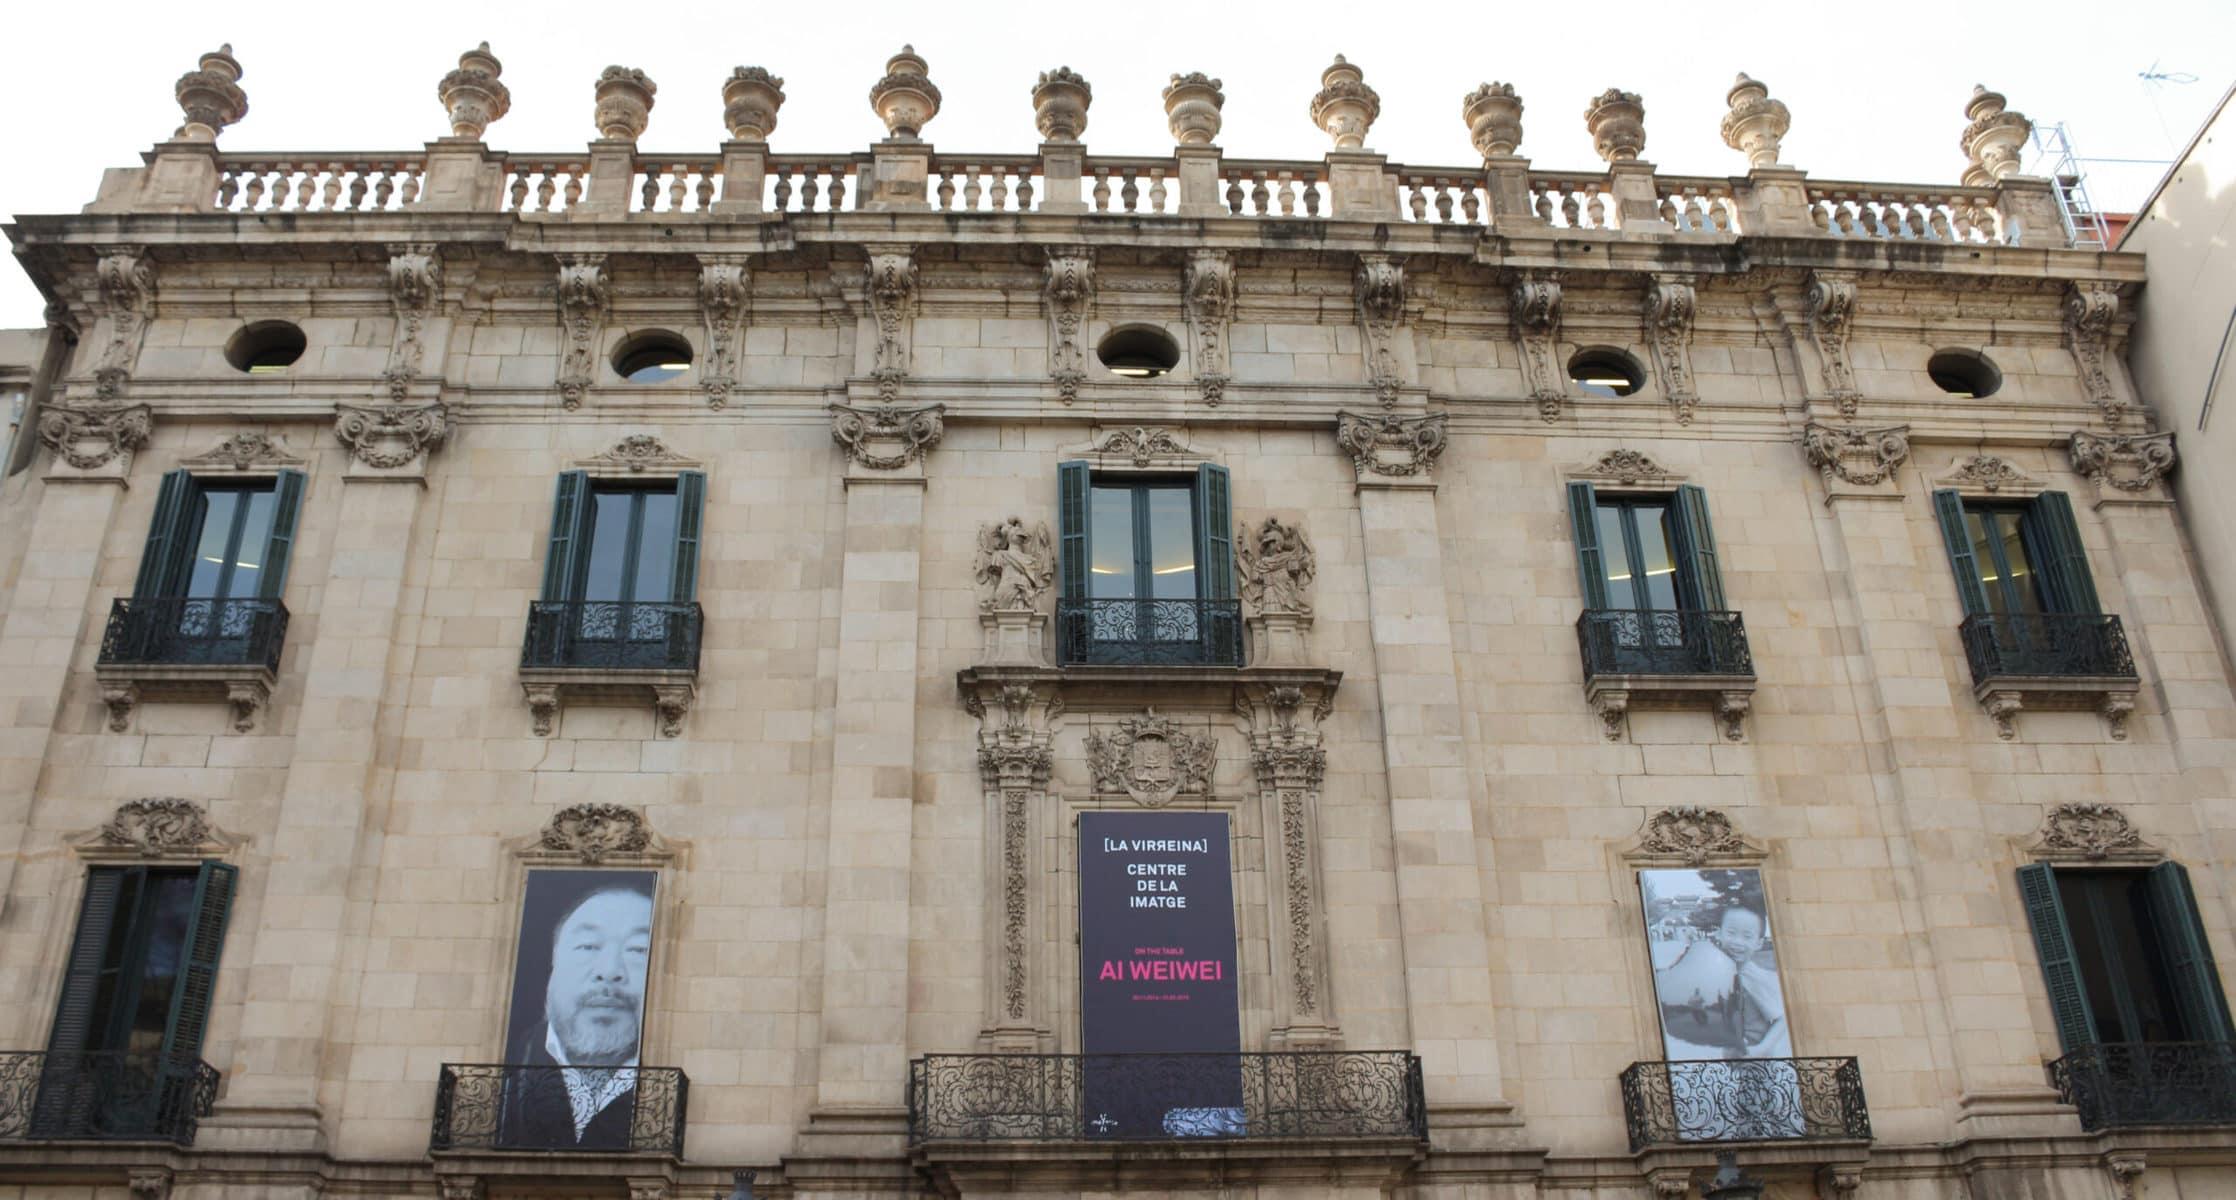 "Ausstellung: Ai Weiwei ""On the table"", Palau de la Virreina, Barcelona"